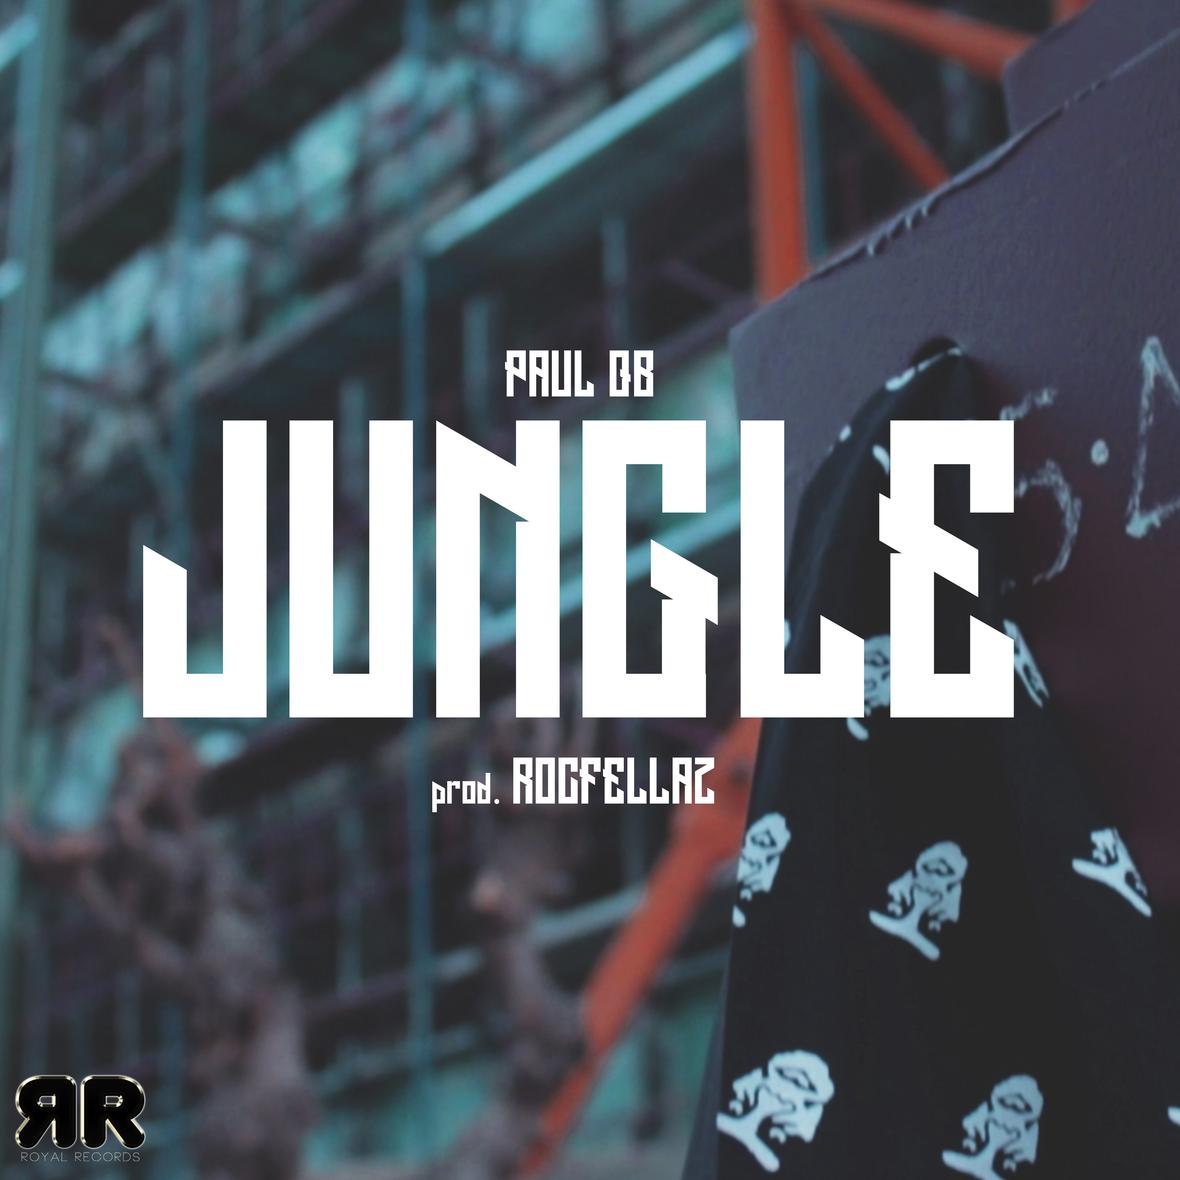 Paul QB - Jungle Official digital single cover 2019